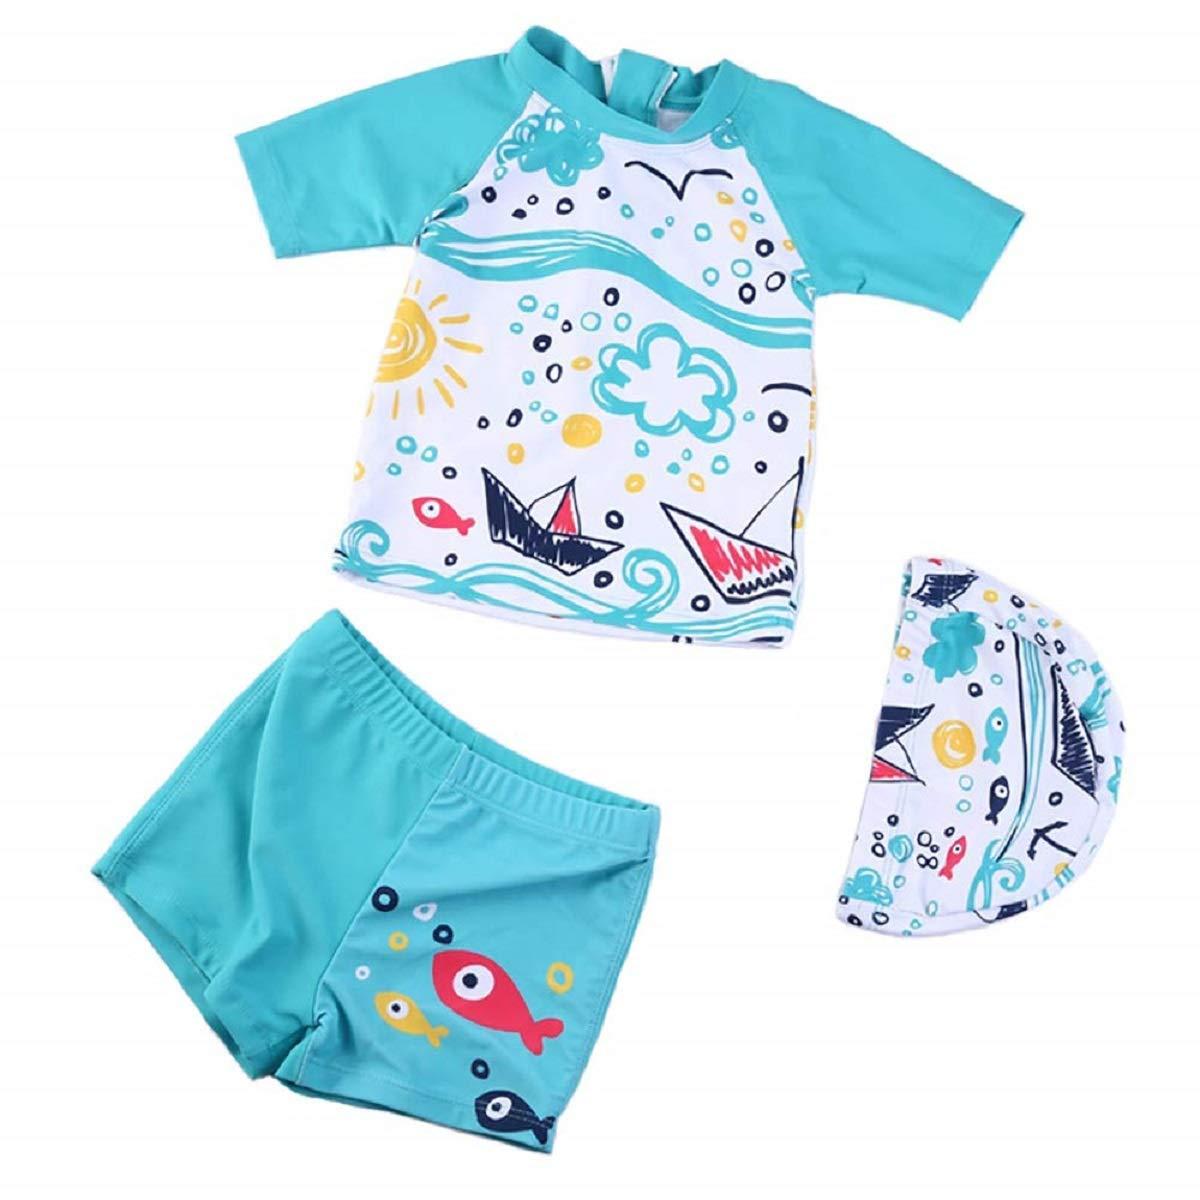 Toddler Baby Boys Short Sleeve Sun Protection Dinosaur Swimsuit Three Piece Kids Little Boys Rash Guard Round Neck Swimwear